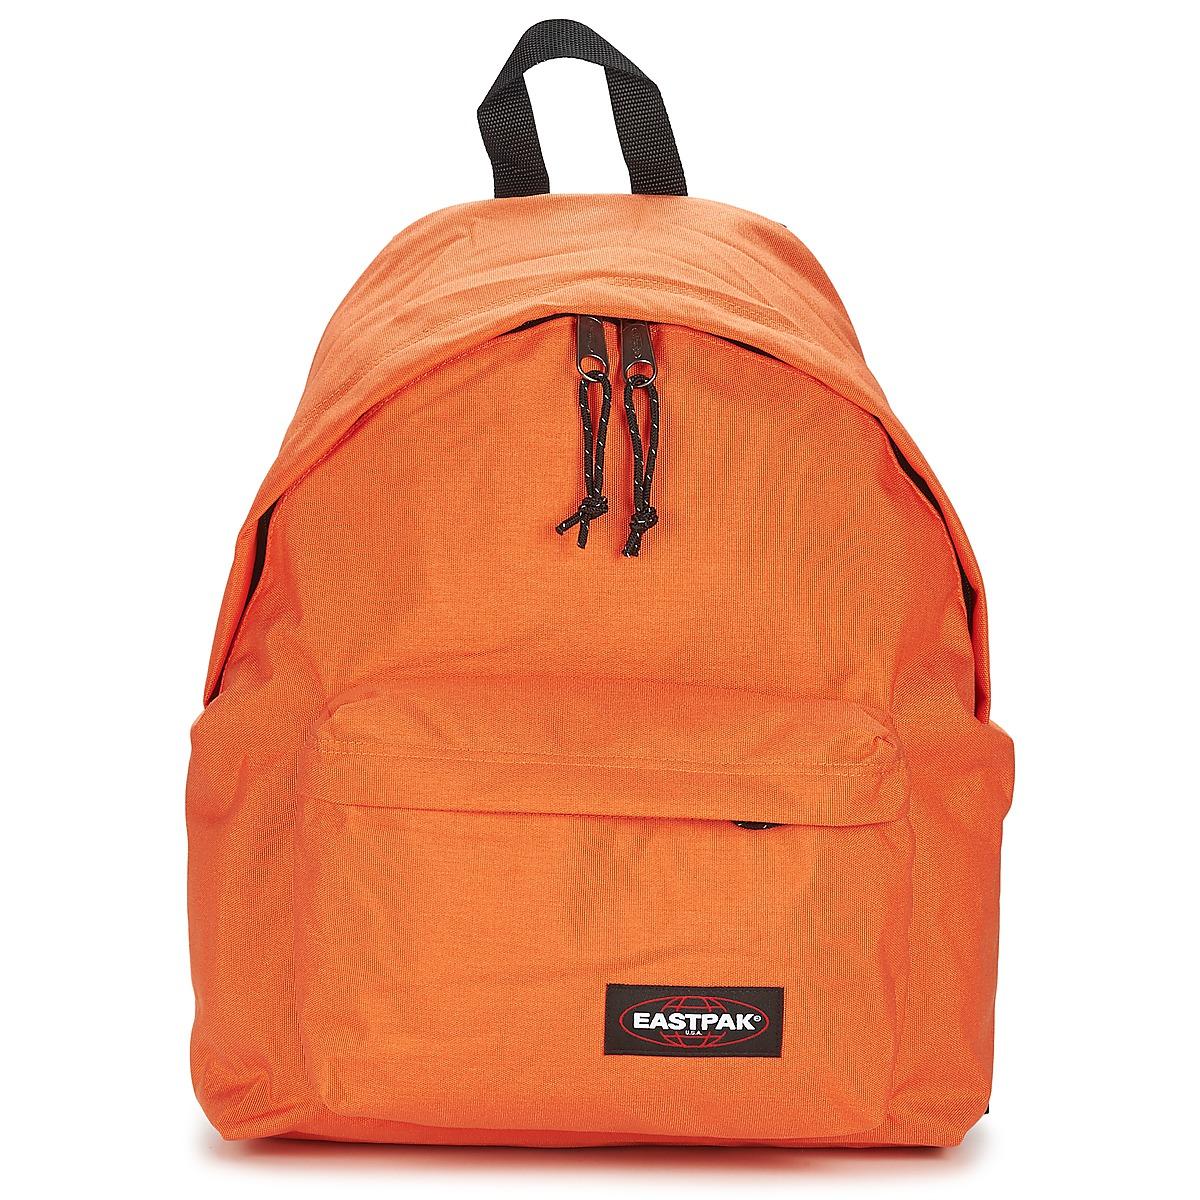 Sac A Dos Eastpak Padded Pak'R Ek620 Orange OlelINp